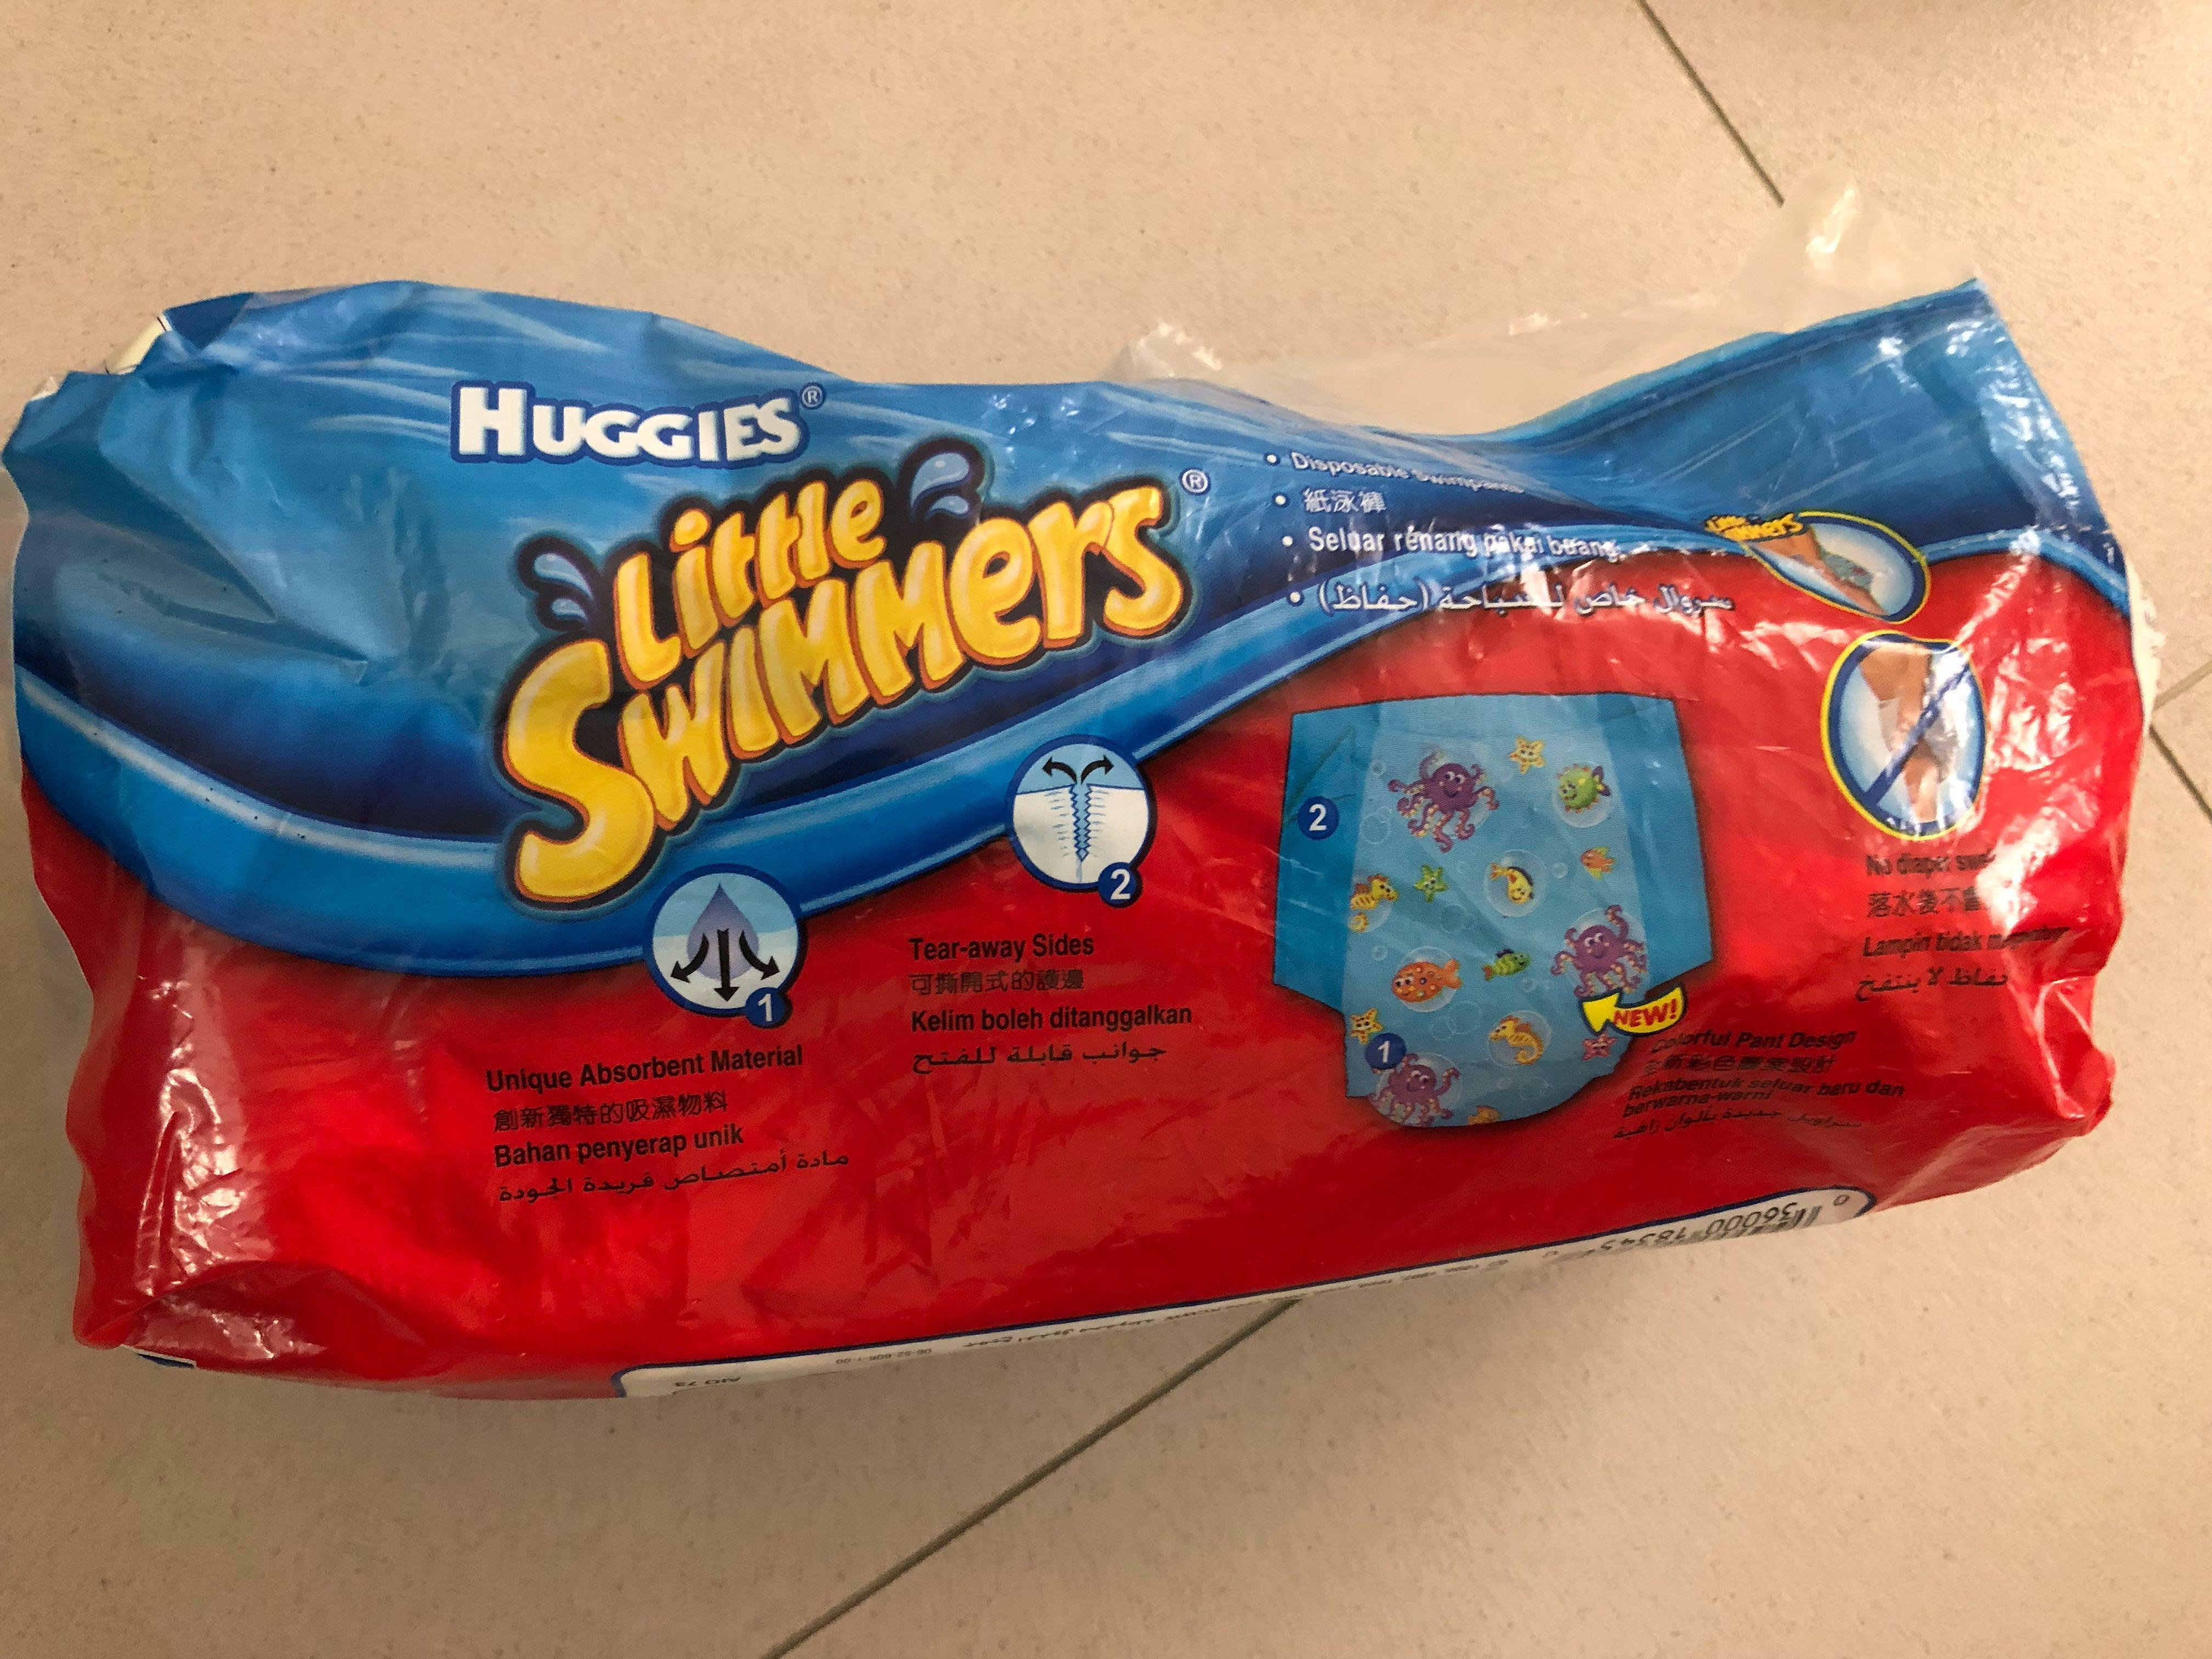 Diapers pull up pampers Huggies swim diaper not tokidoki Adidas Prada under armour